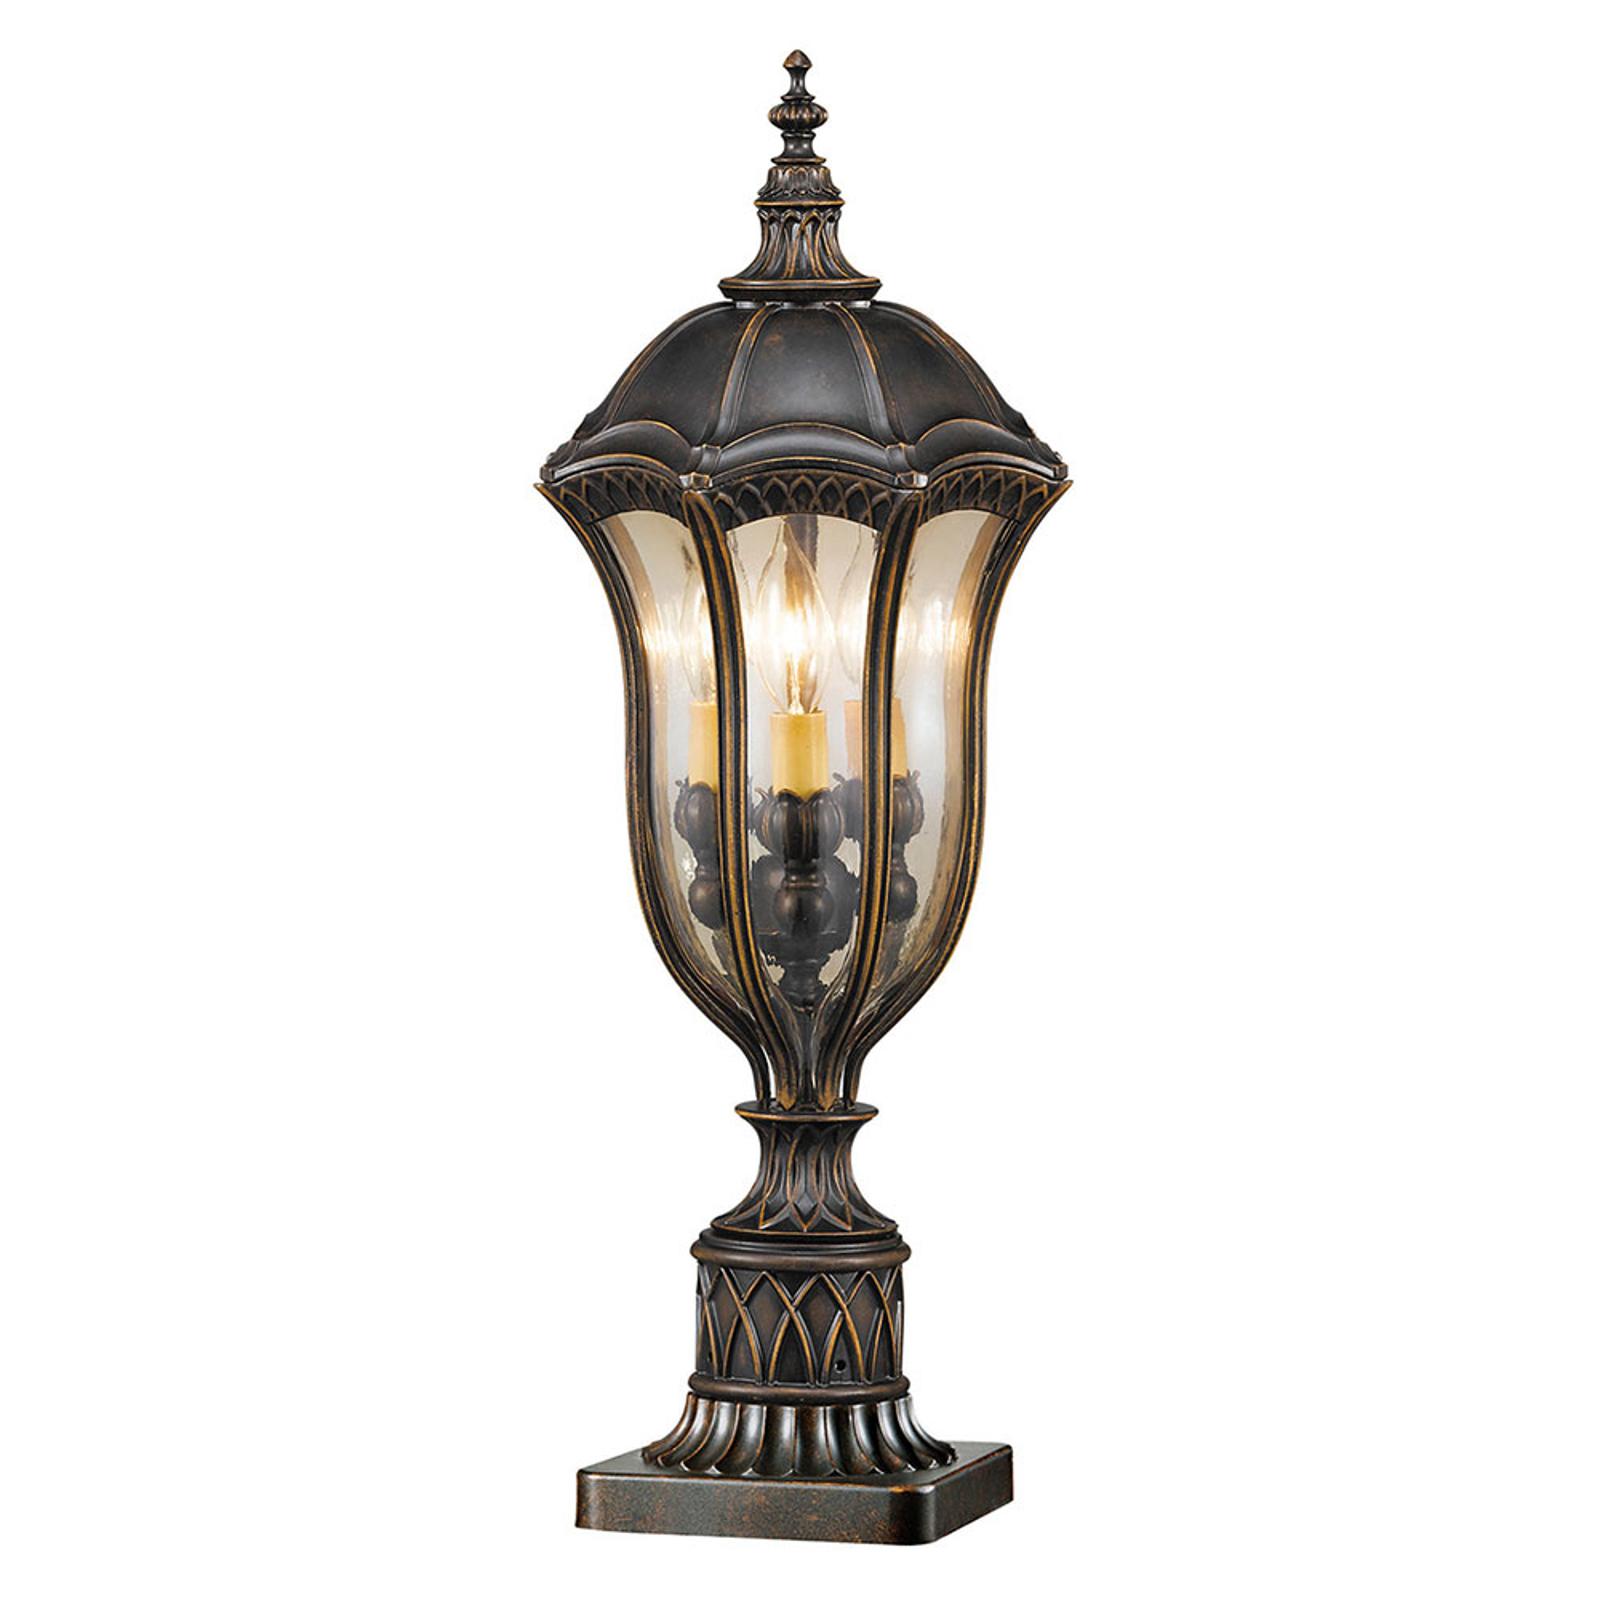 Sokkellampe Baton Rouge antikk